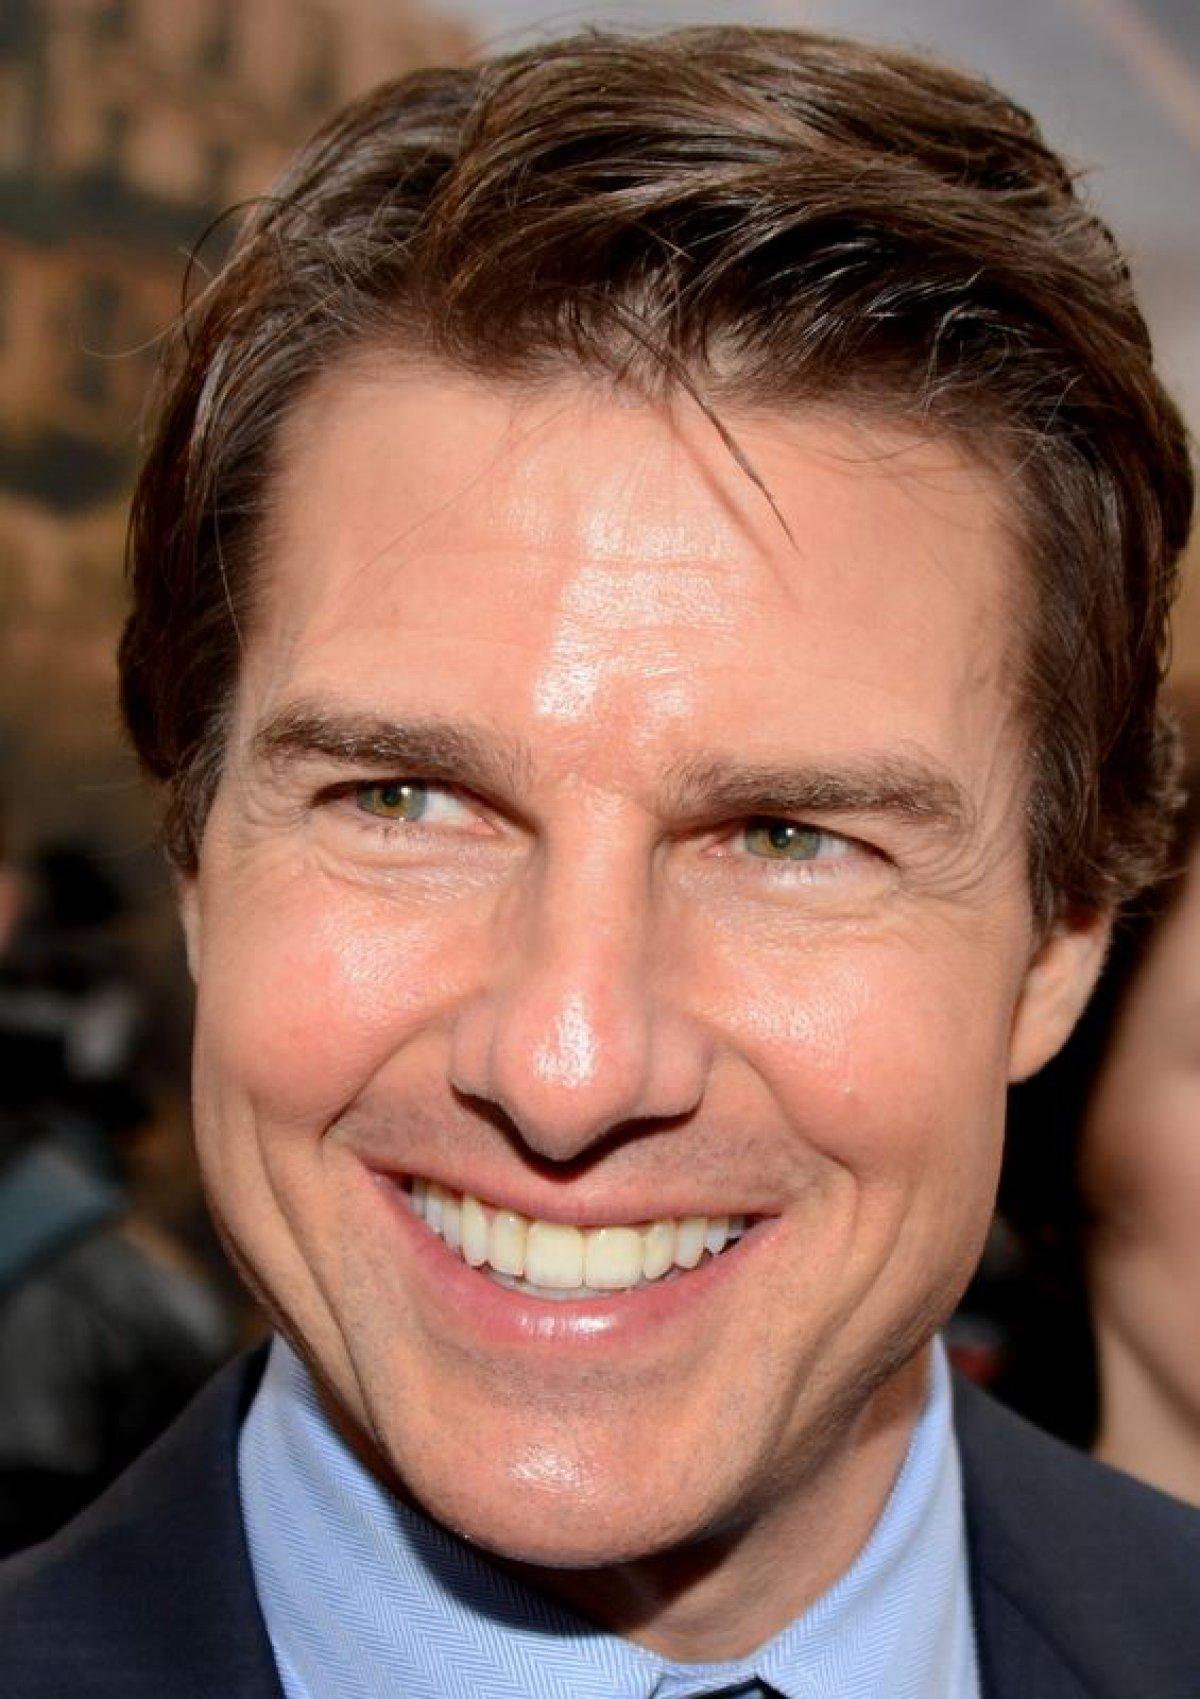 Cruise: Jett Travolta's death was horrific - Reality TV World